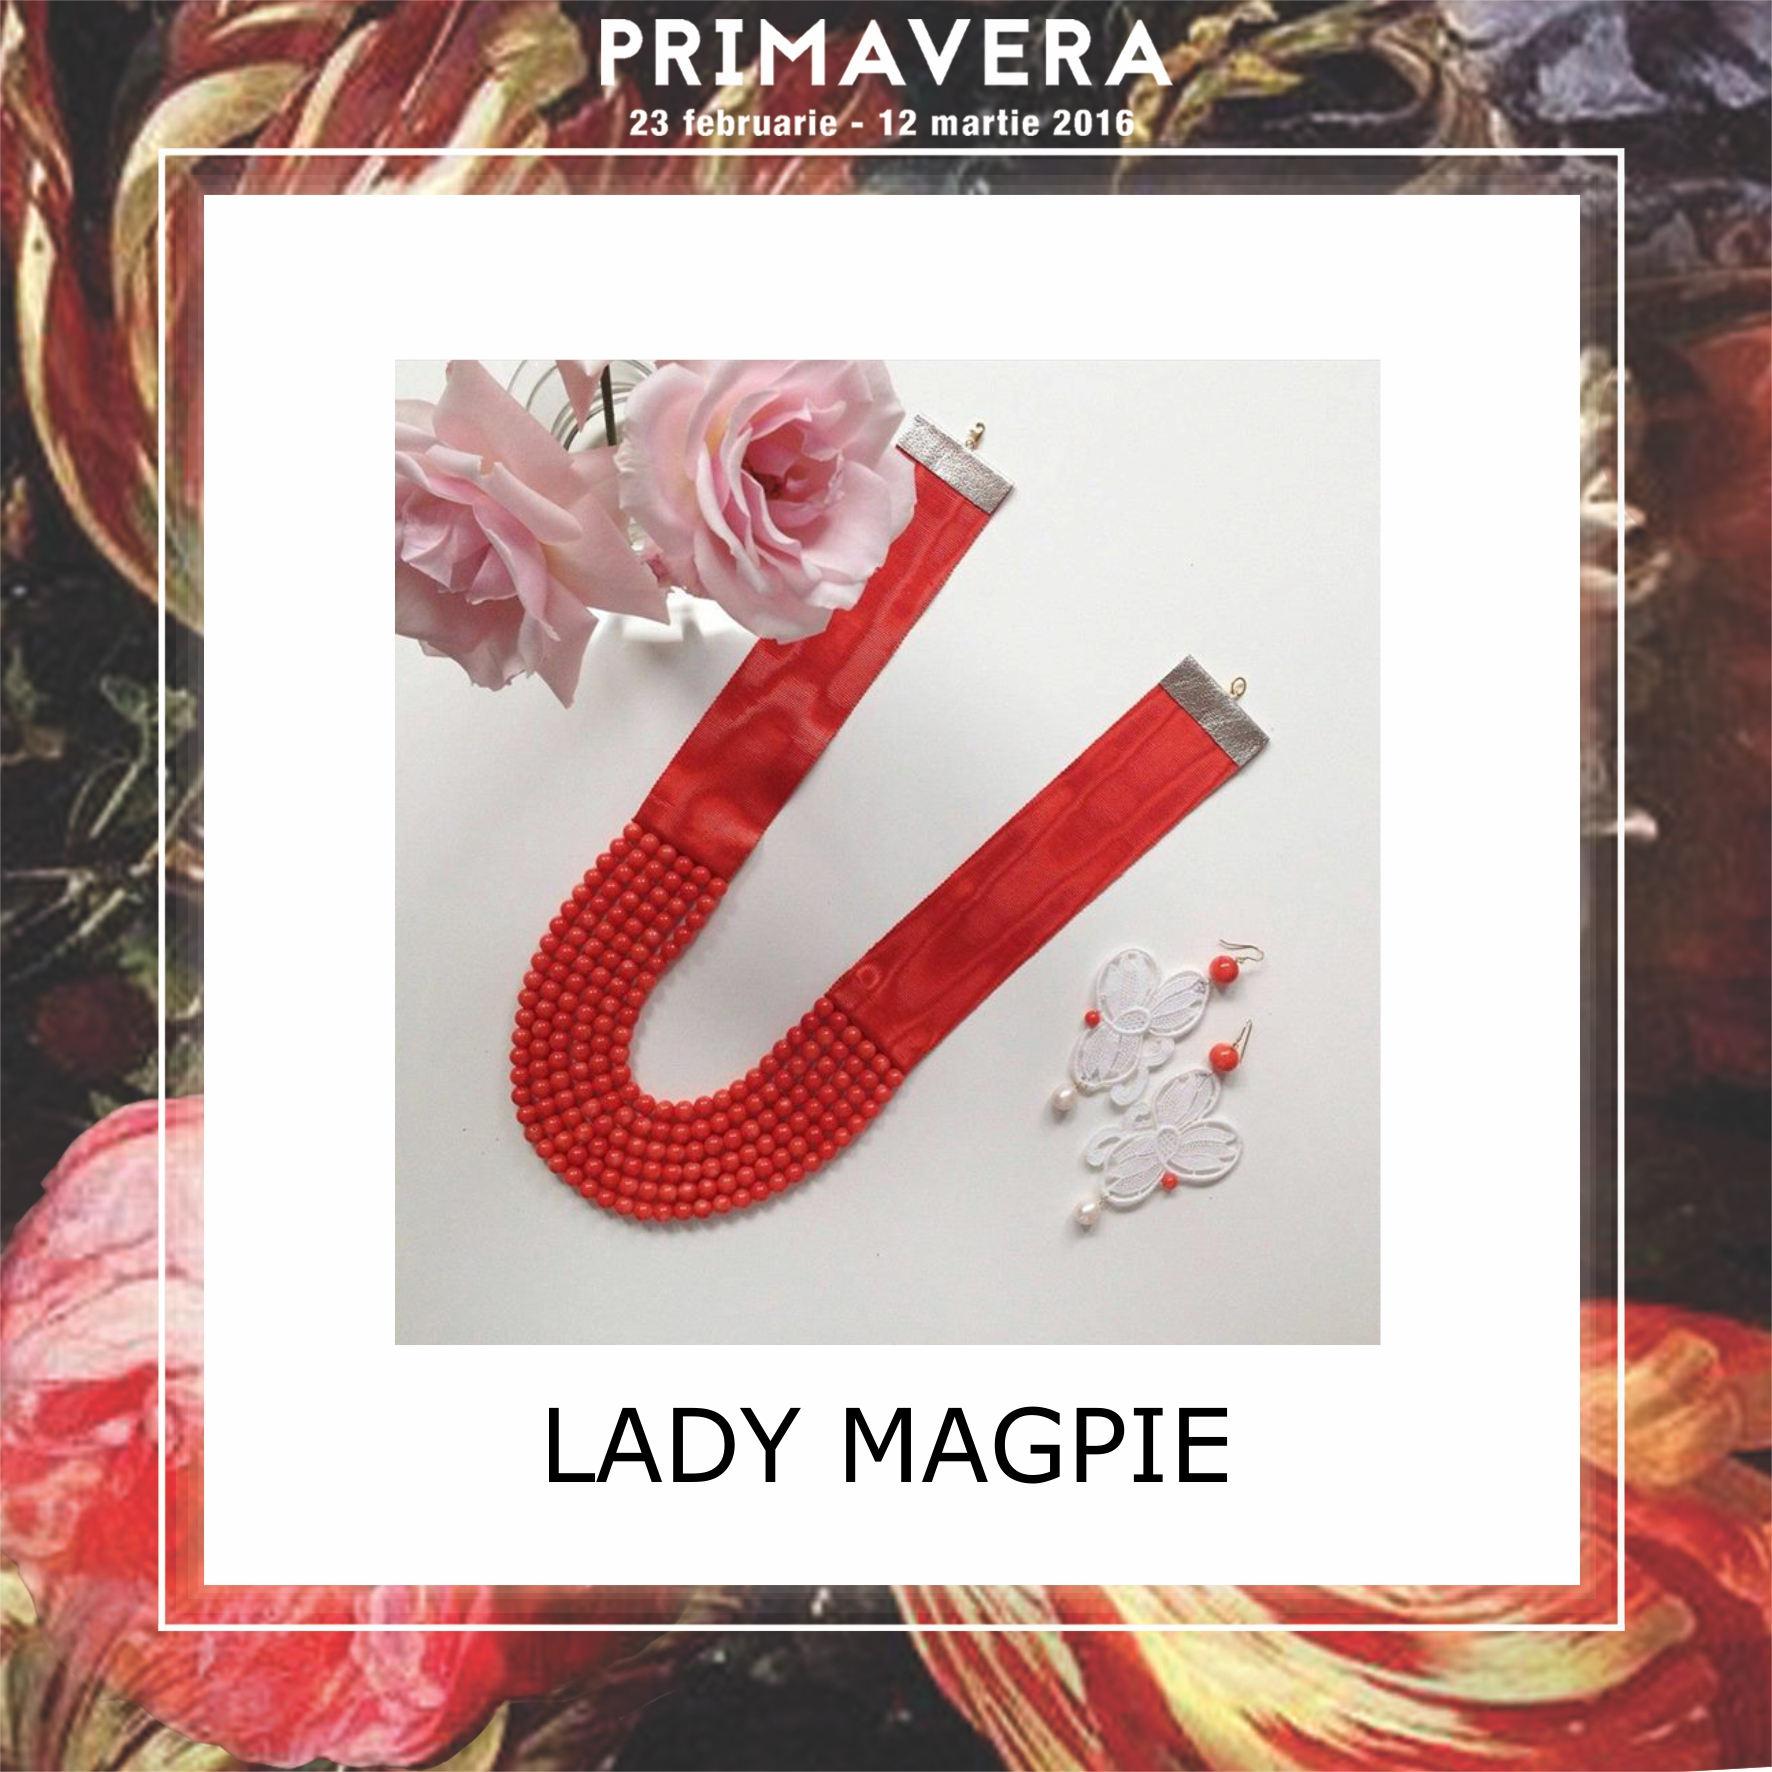 Lady Magpie